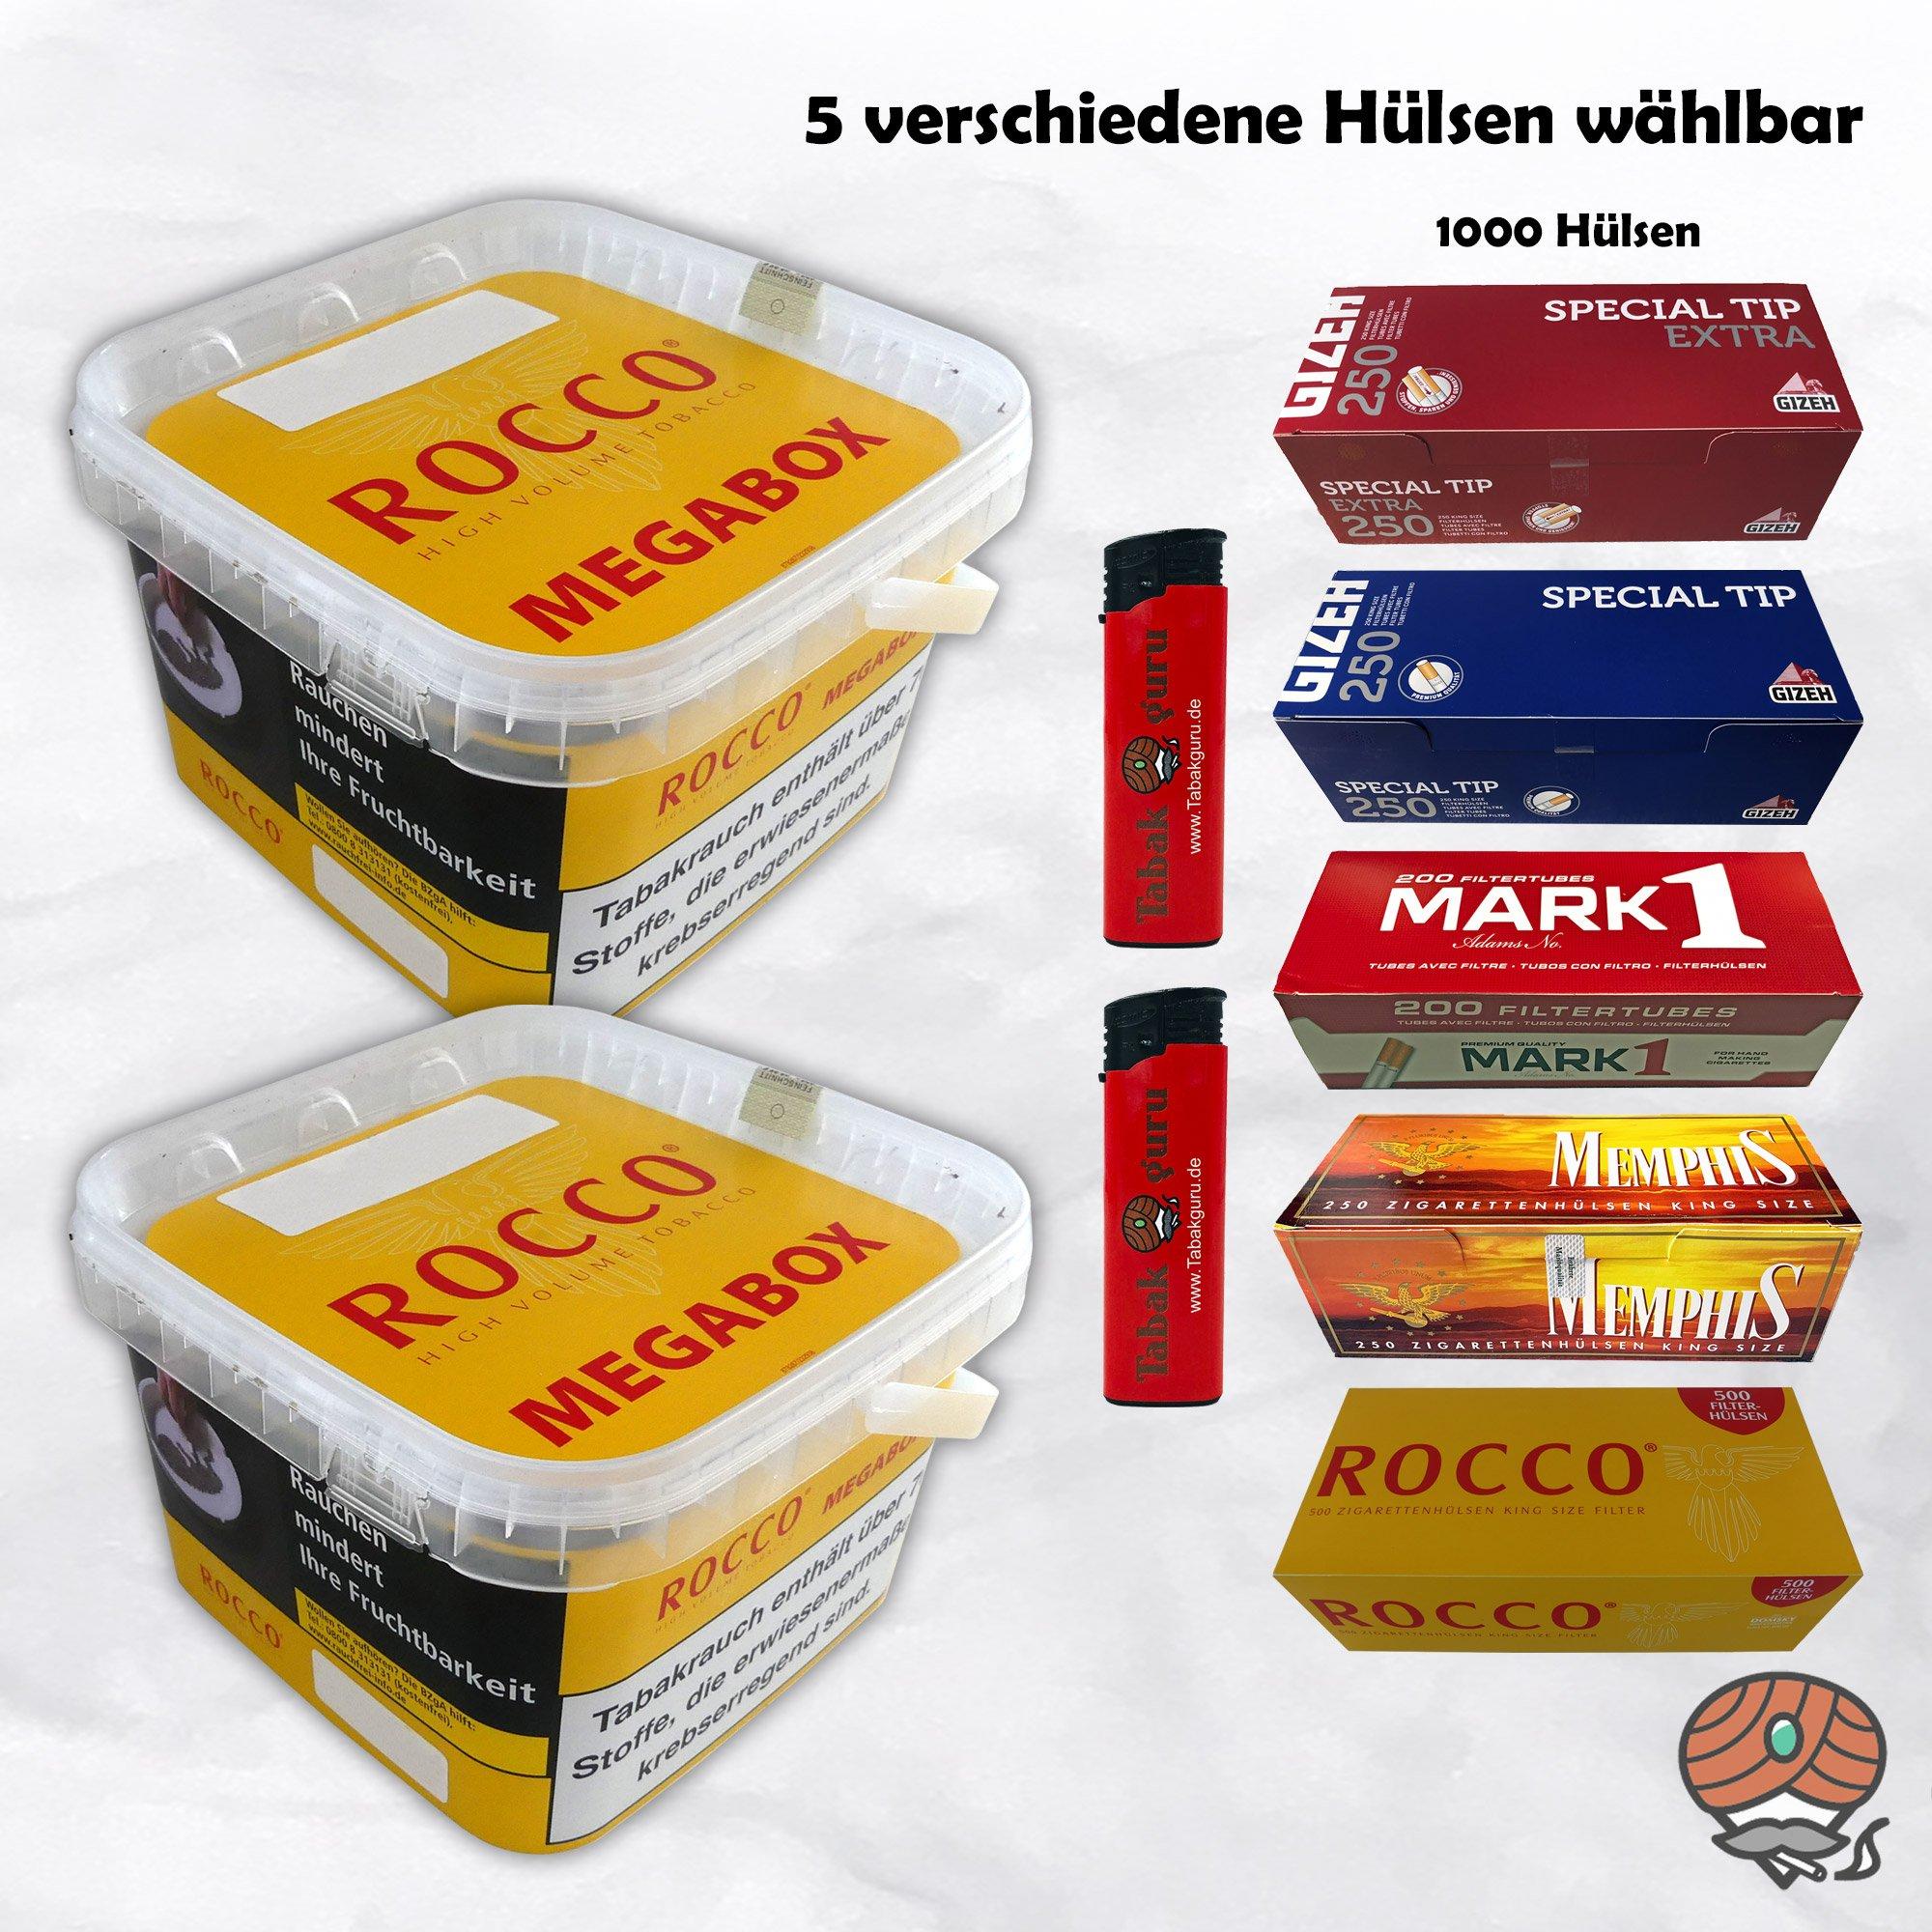 2 x ROCCO Volumentabak Gelb Megabox 210 g + 1.000 Hülsen wählbar - Angebot ohne Hülsen